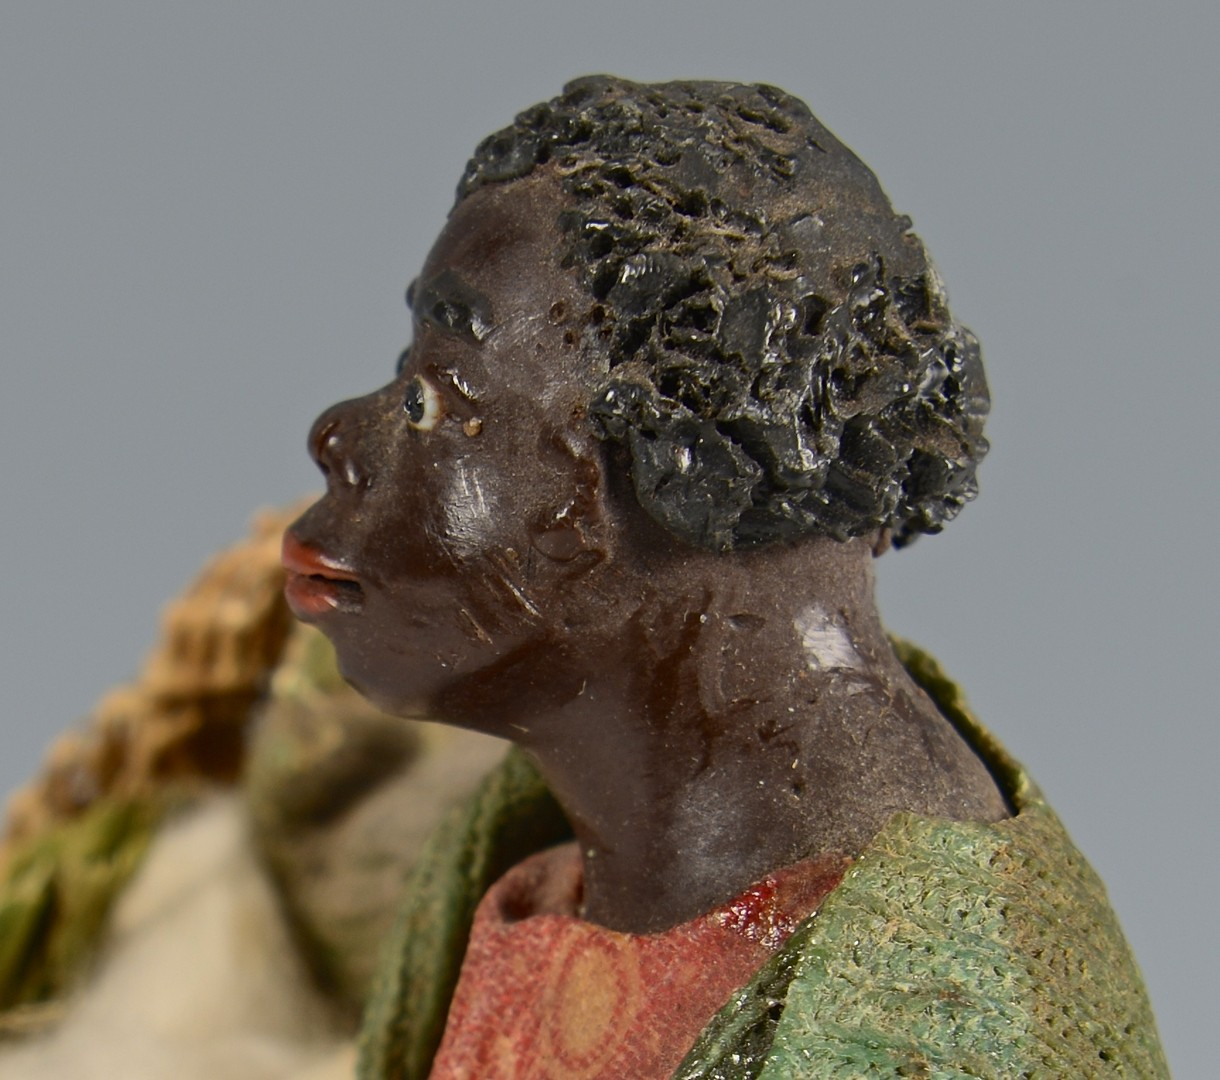 Lot 256: African American Wax Sculpture